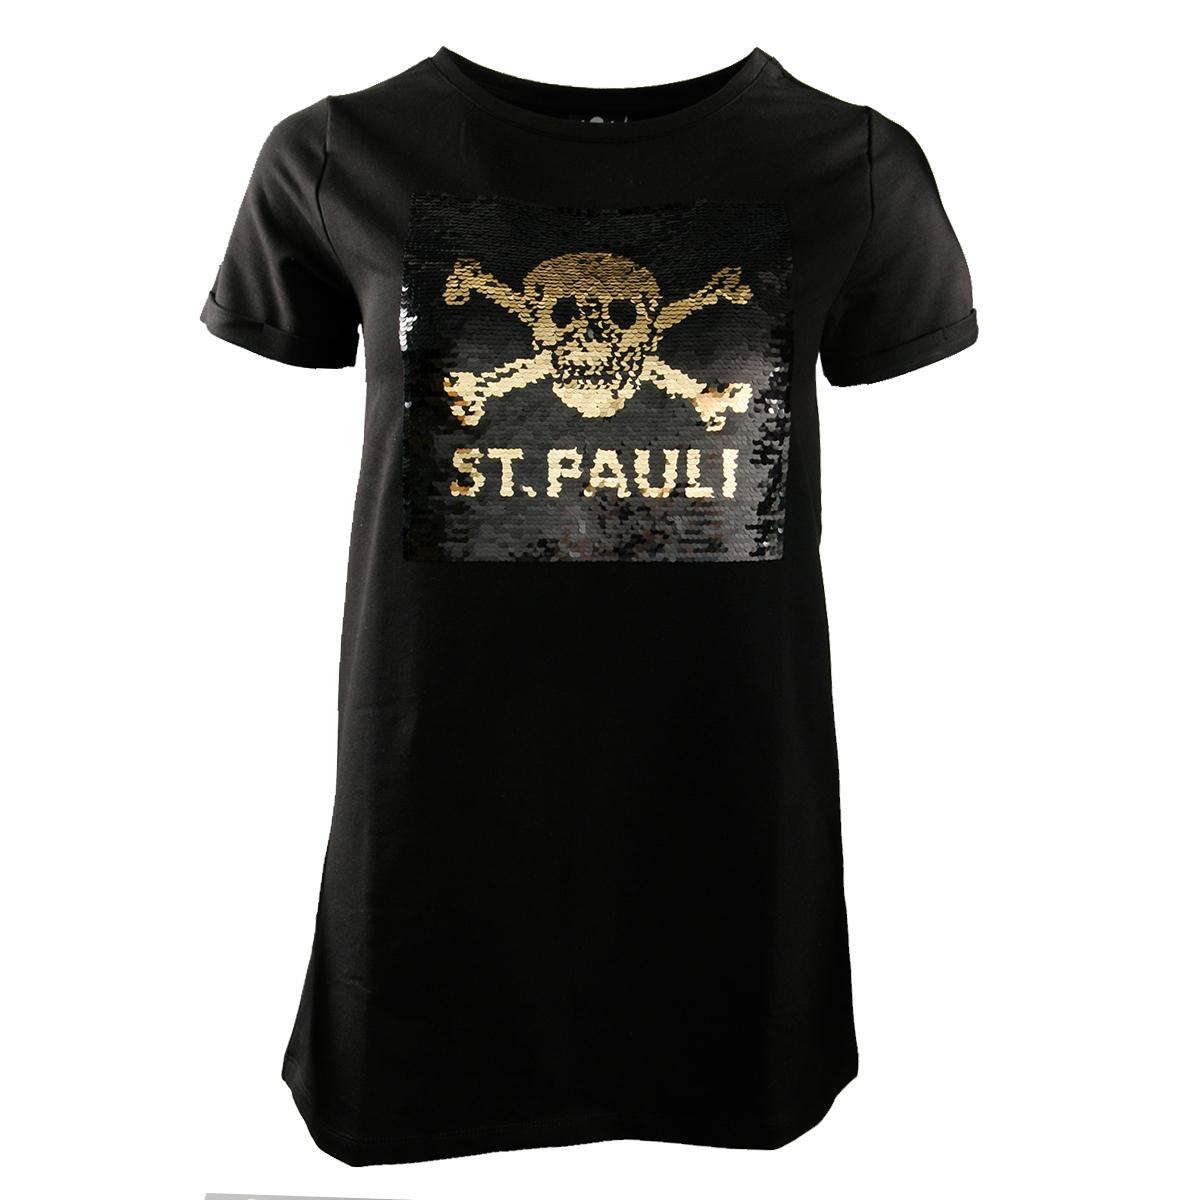 FC St. Pauli - Damen T-Shirt Black Matte Totenkopf - schwarz